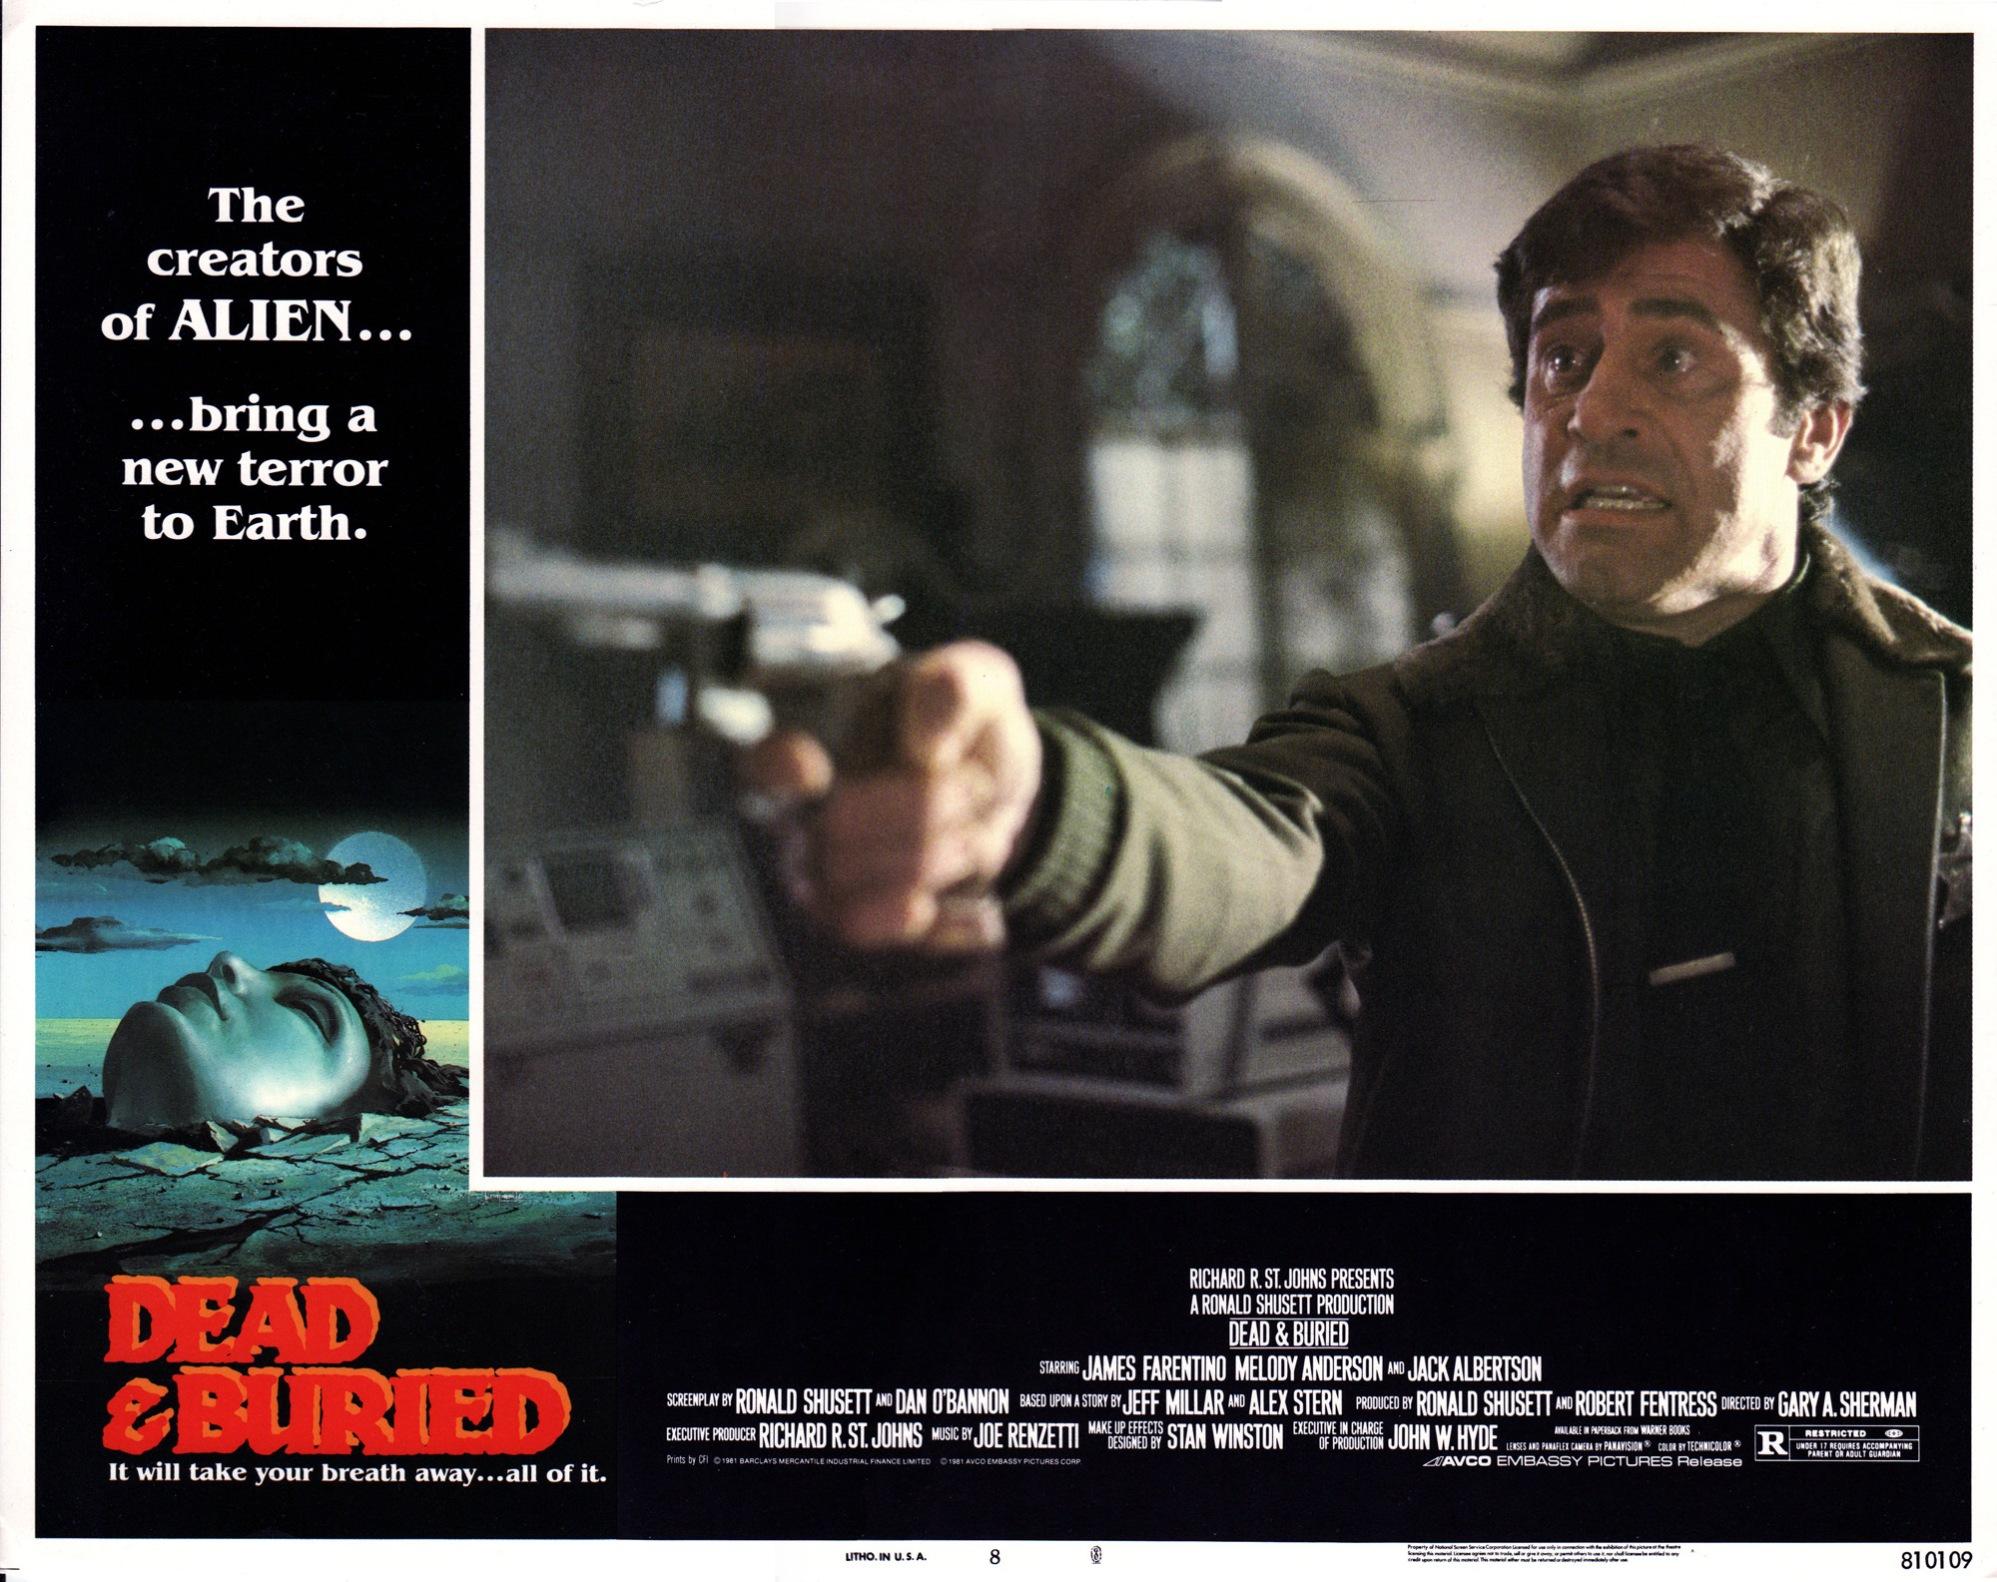 deadandburied-usa-16